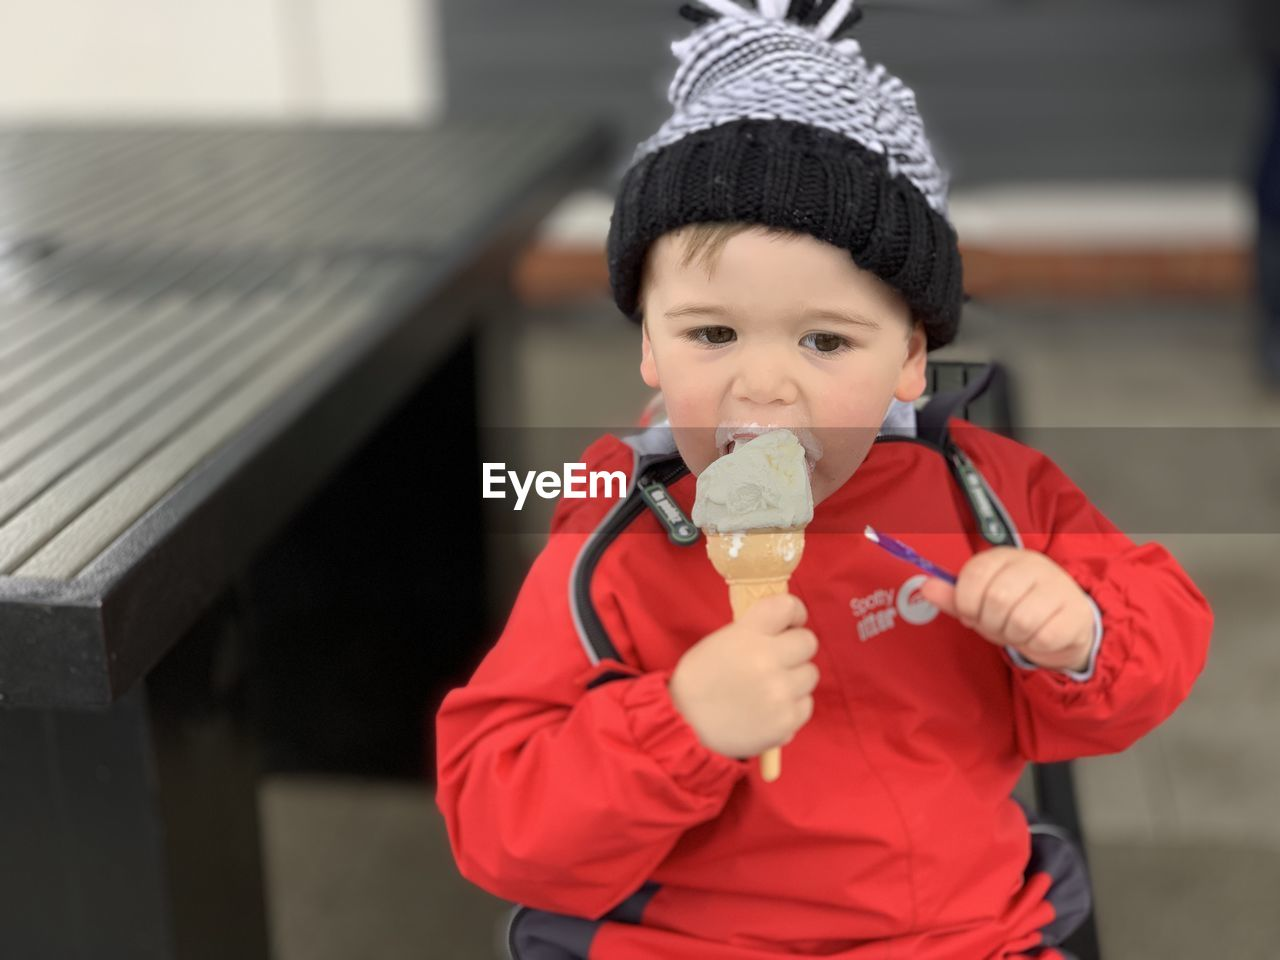 CUTE BOY HOLDING ICE CREAM OUTDOORS